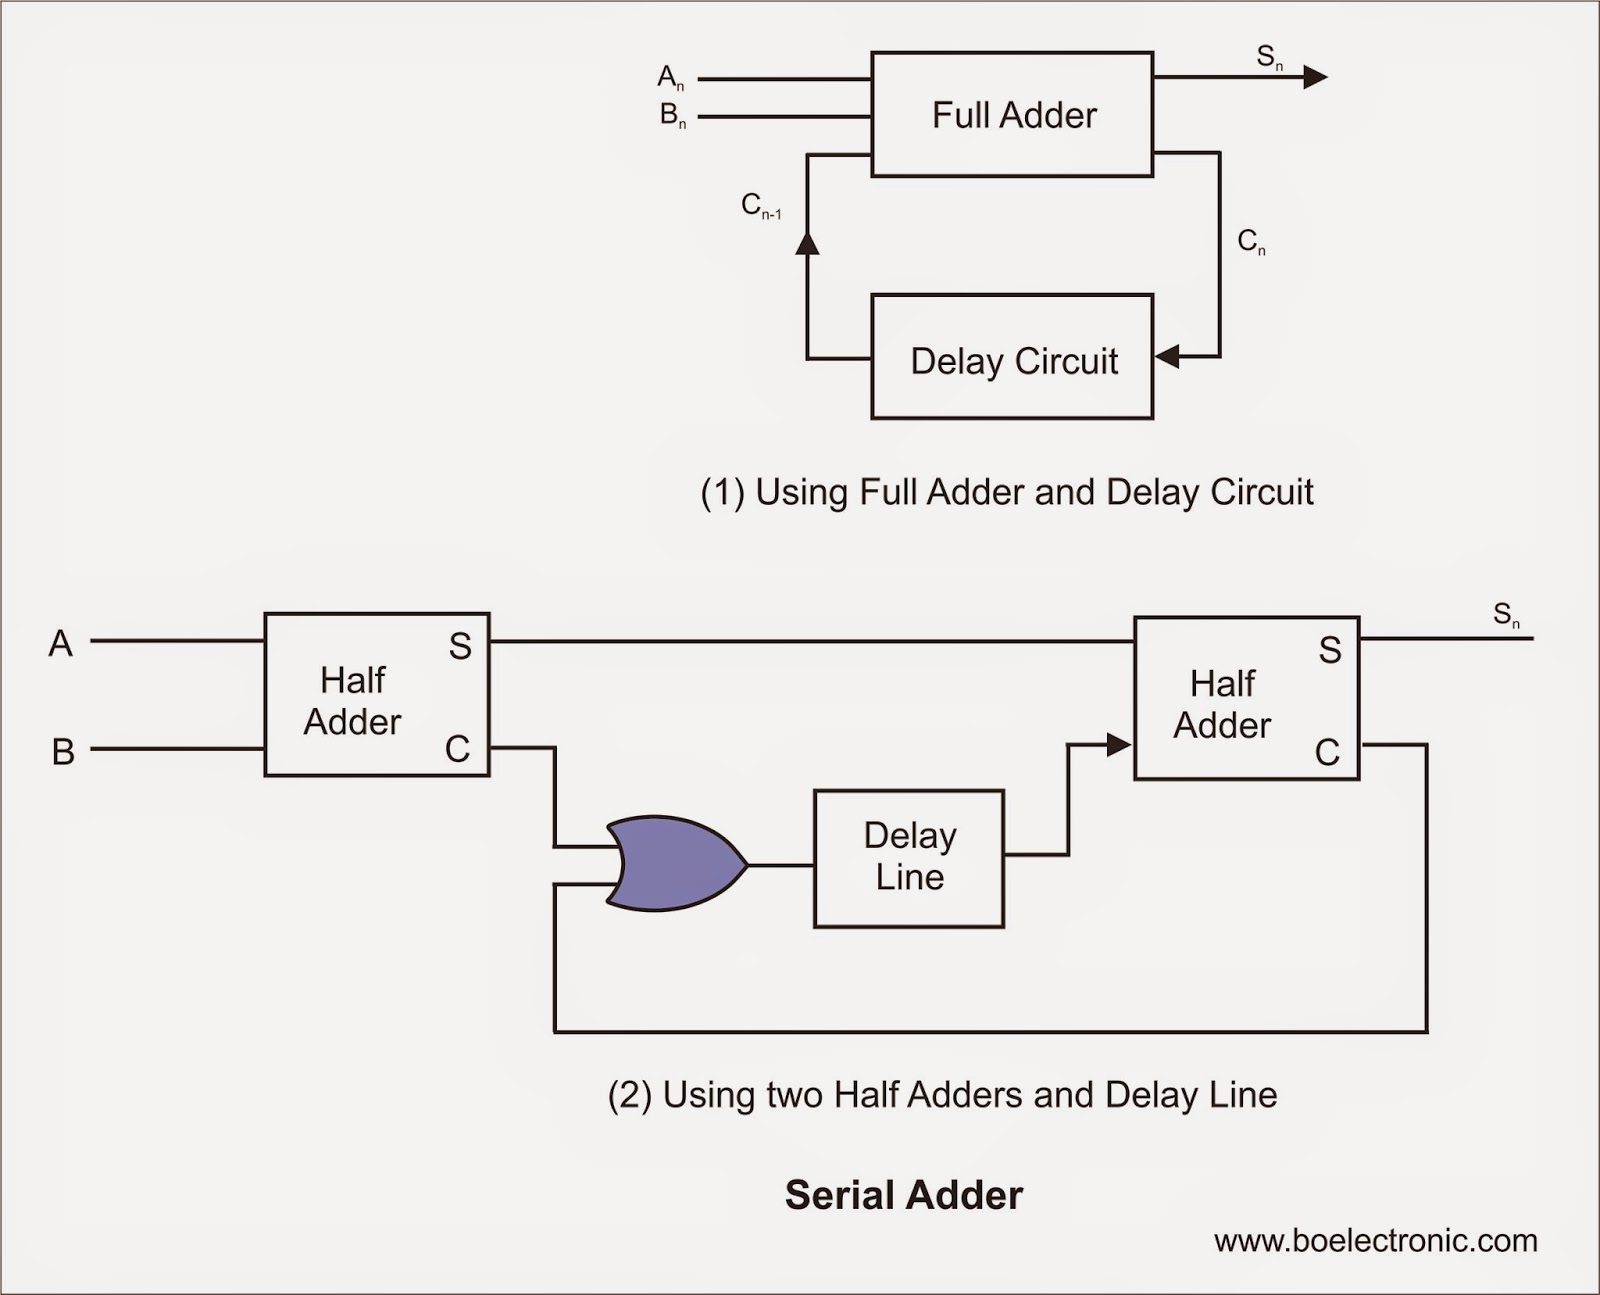 medium resolution of full adder block diagram photo 24